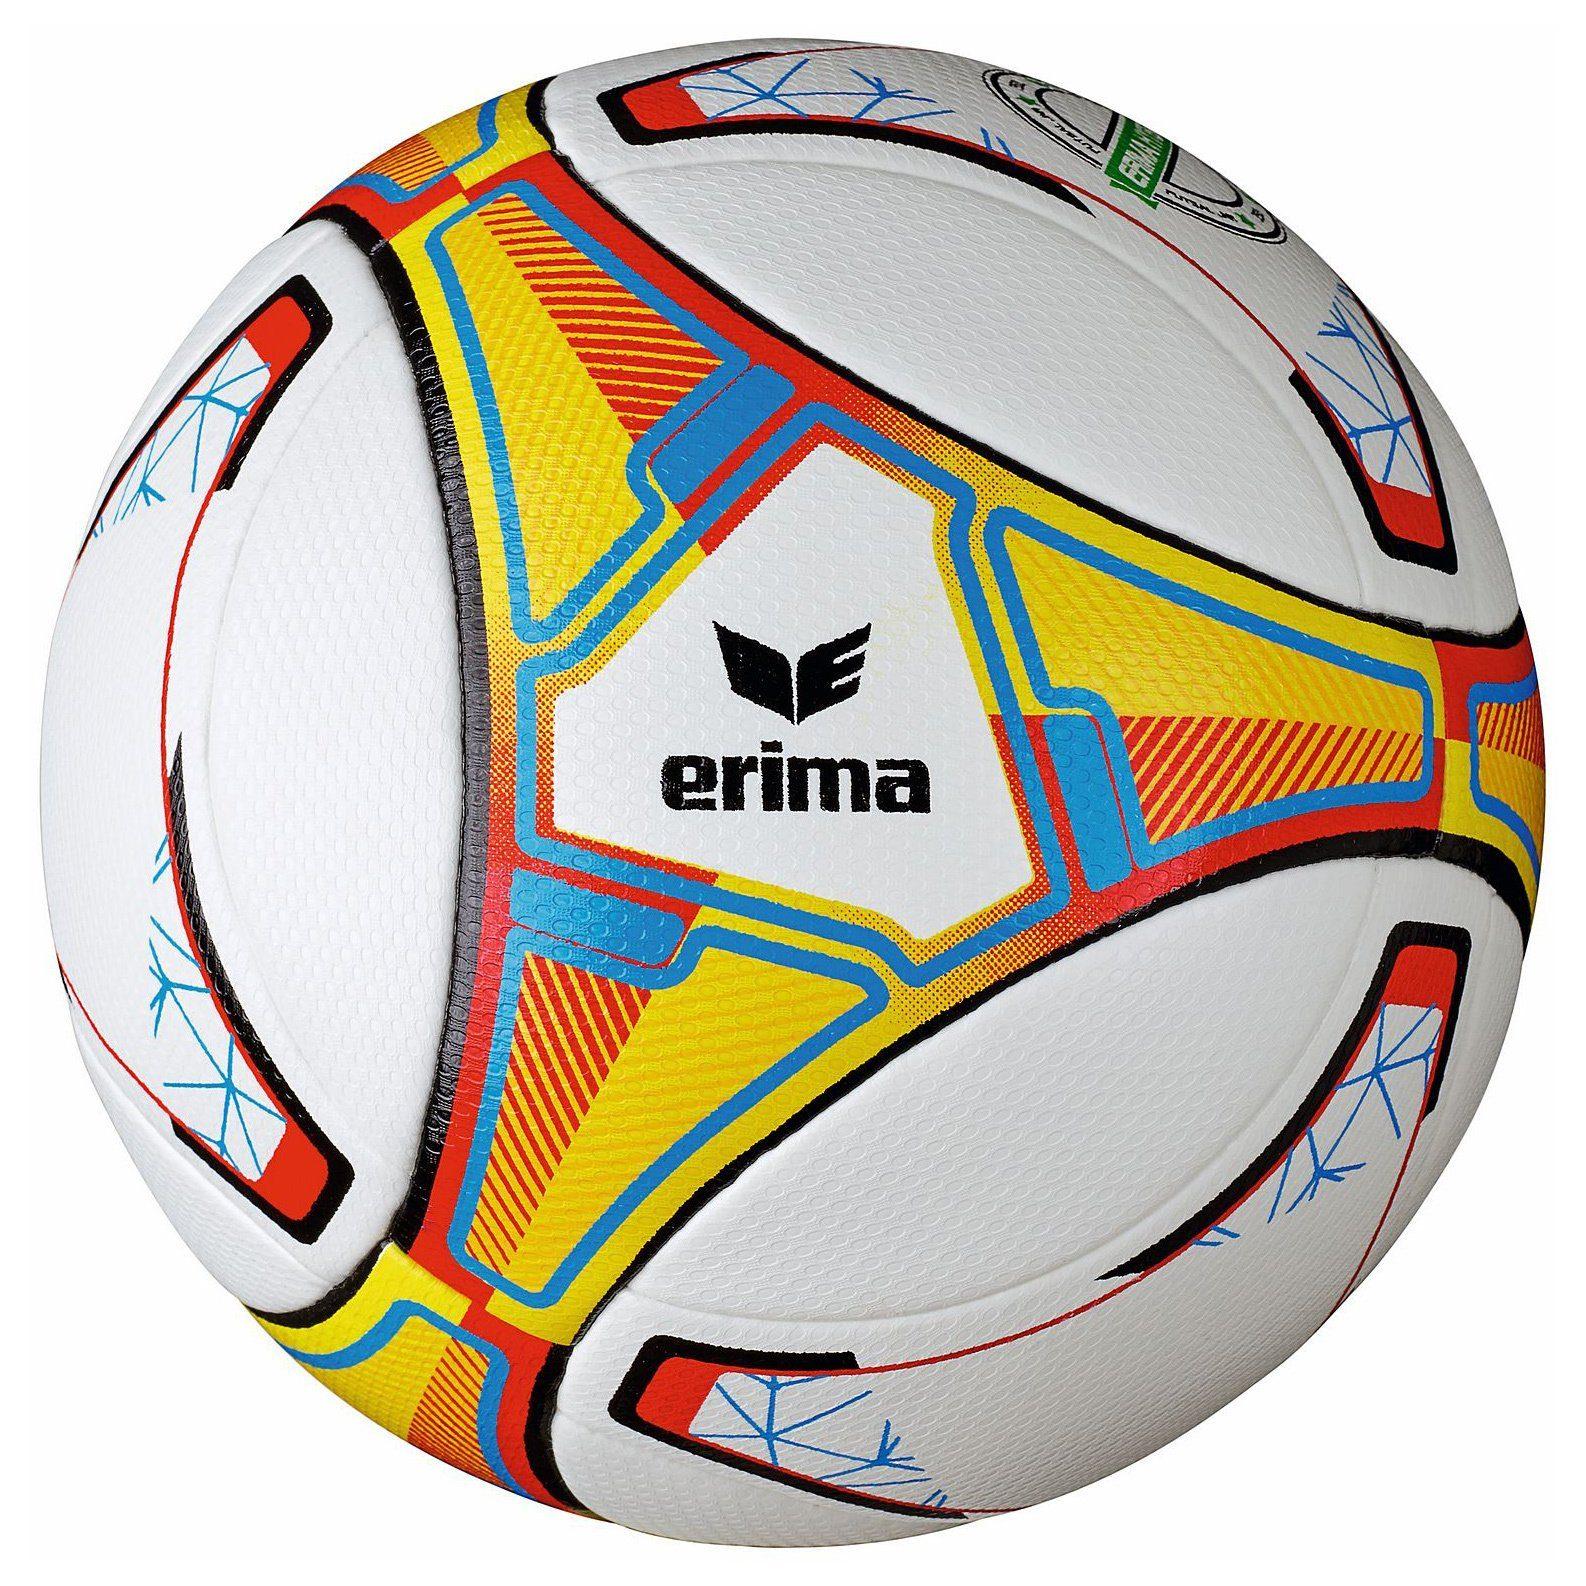 ERIMA Hybrid Futsal Junior 350 Matchball